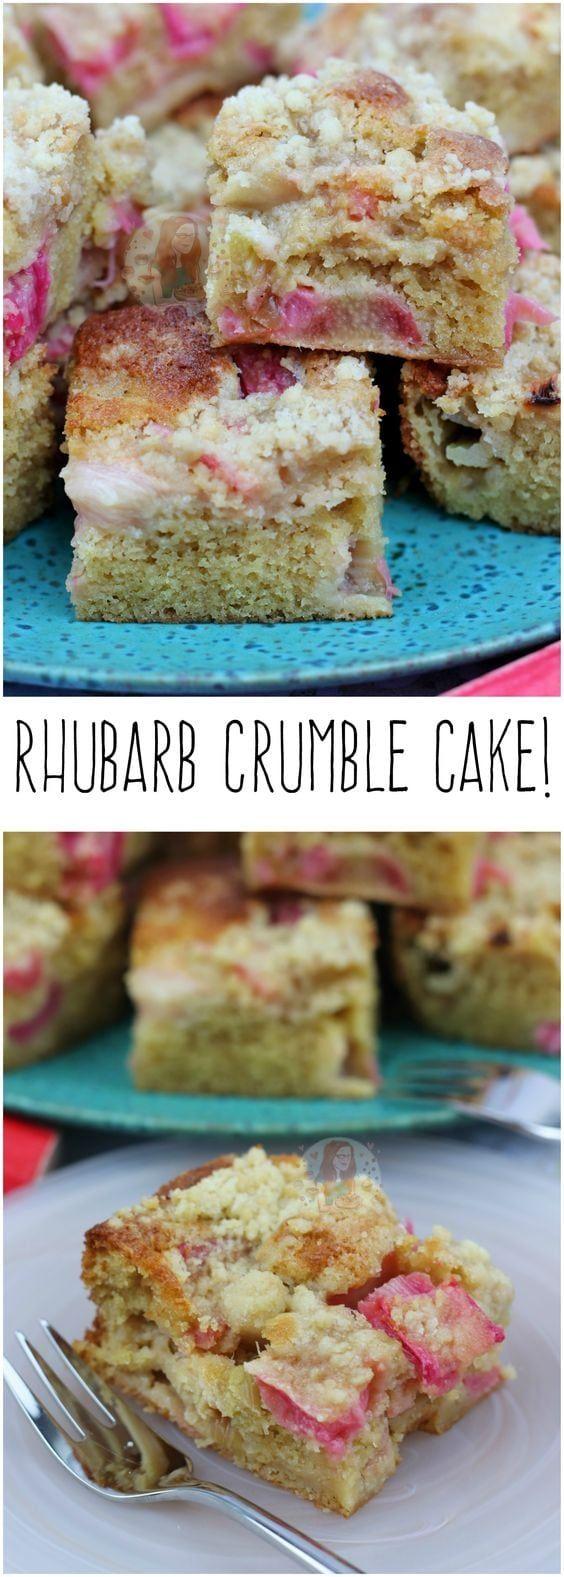 Rhubarb Crumble Cake! - Jane's Patisserie Rhubarb crumble, Rhubarb crumble cake, Rhubarb recipes